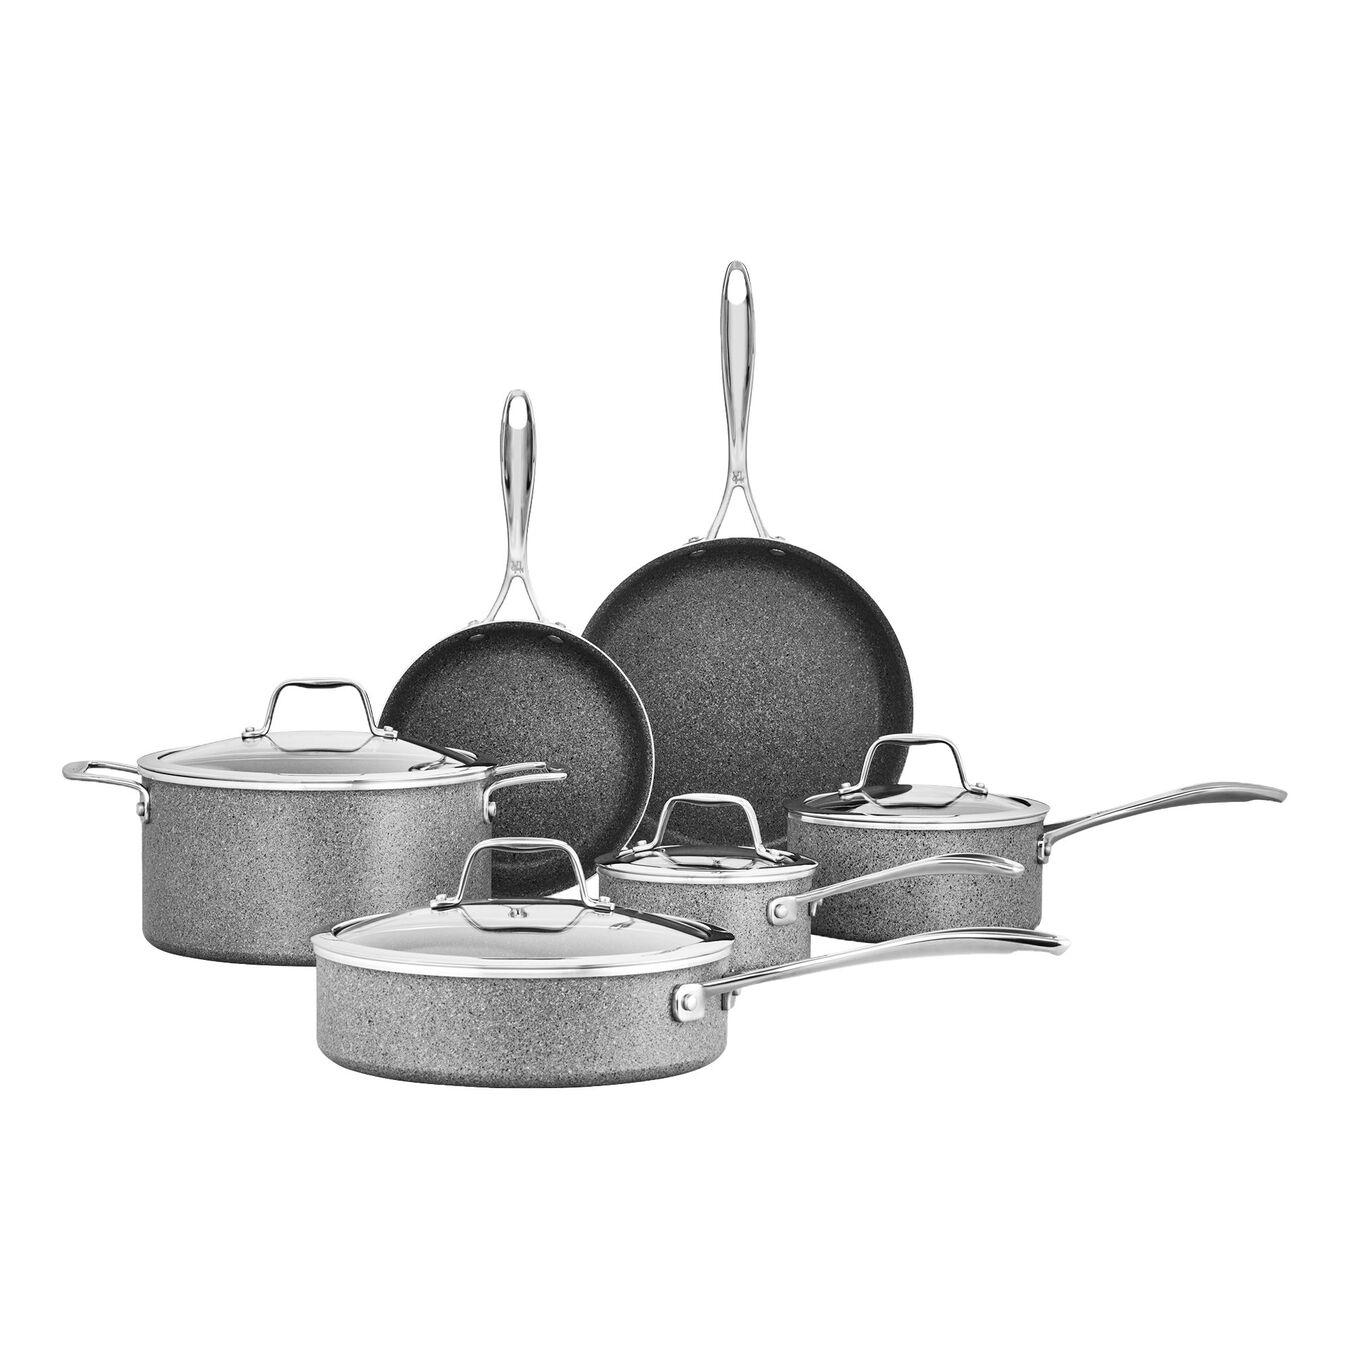 Pot set, 10 Piece   Aluminum,,large 1